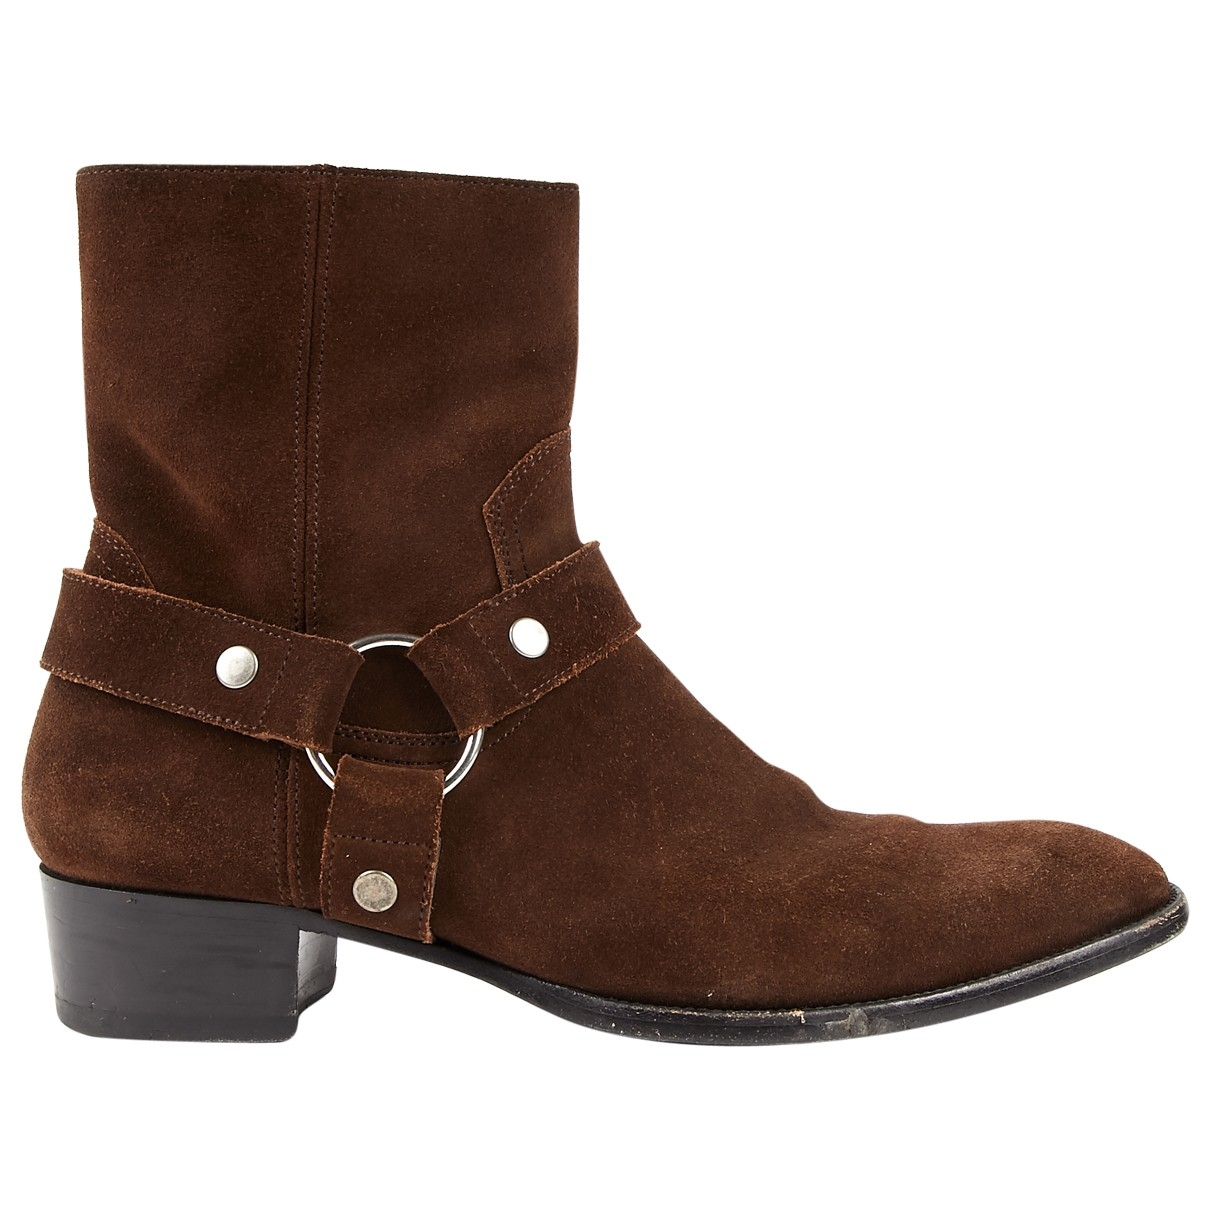 Saint Laurent \N Brown Suede Ankle boots for Women 41 EU